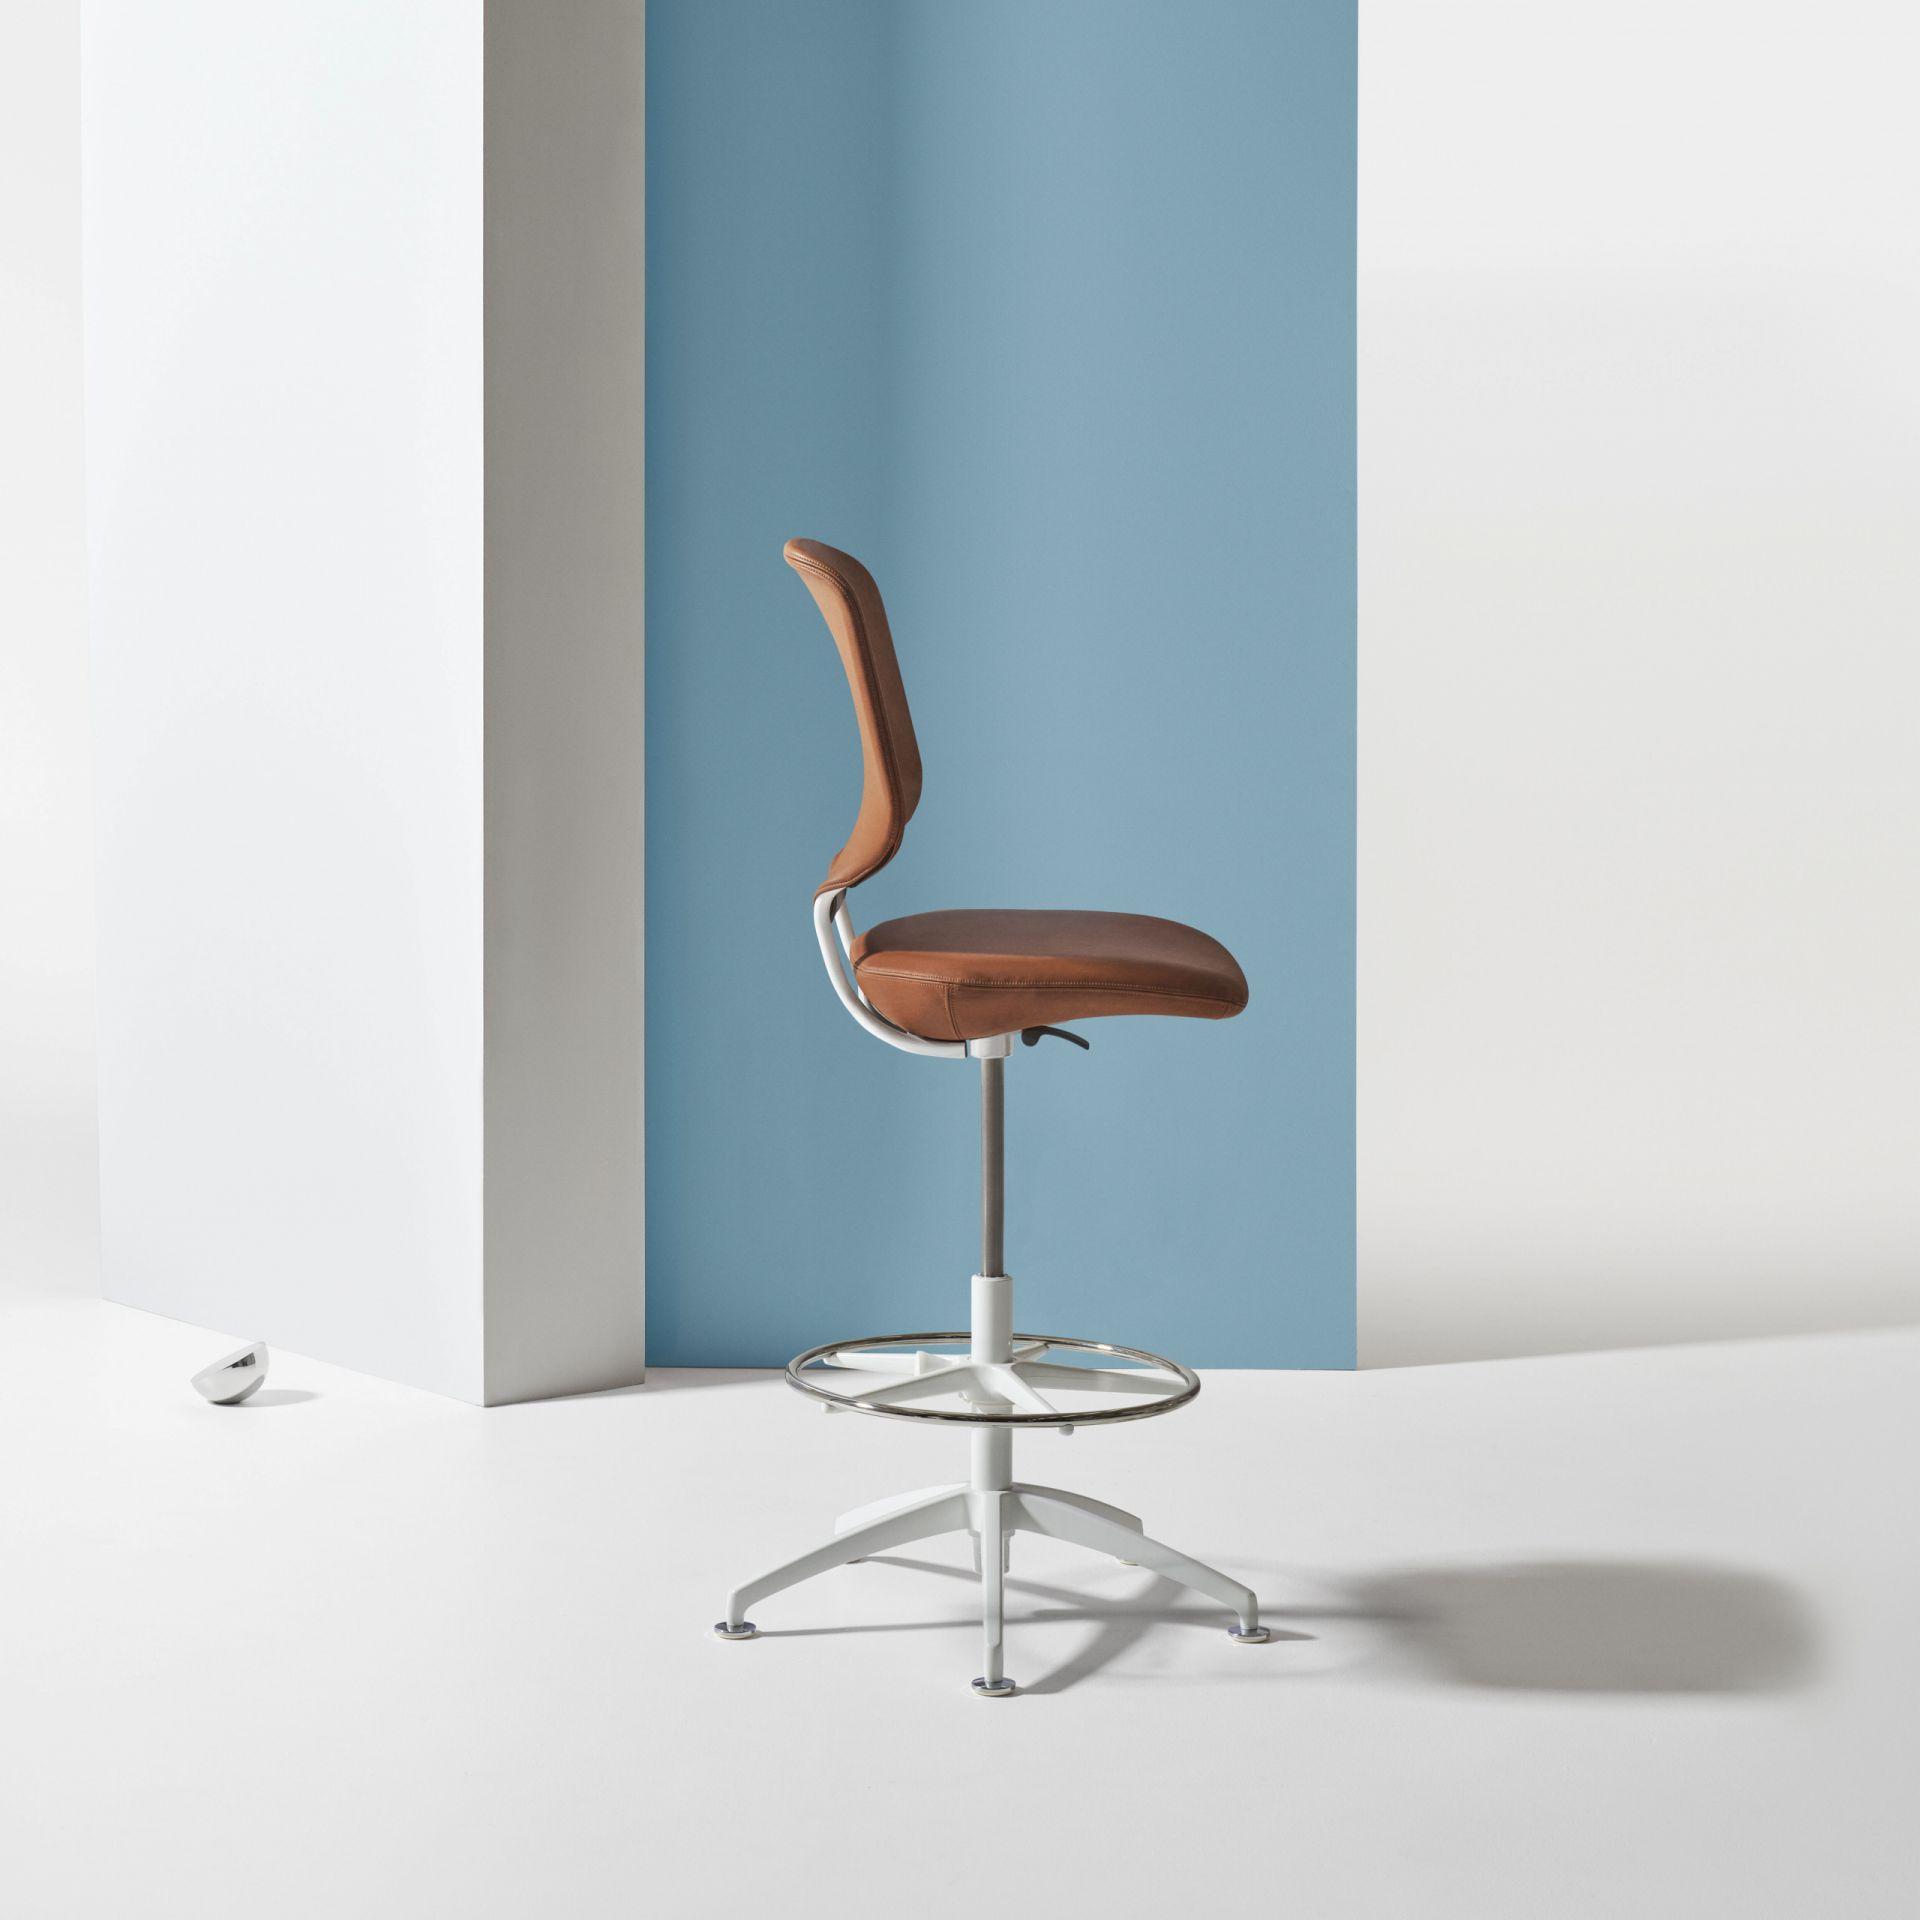 Savo Invite Invite hög stol produktbild 2